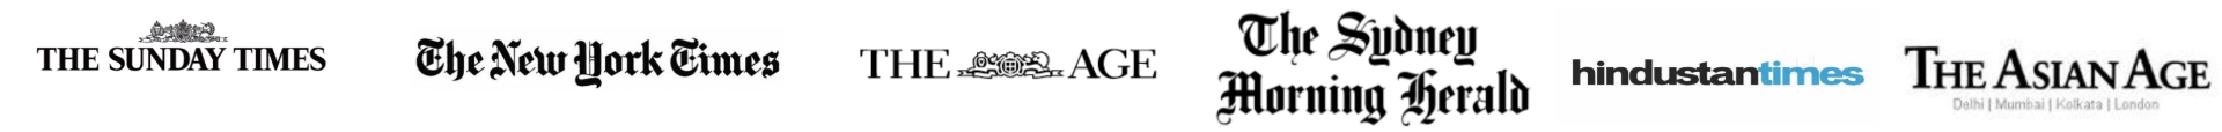 news-logo-banner (1) (1)